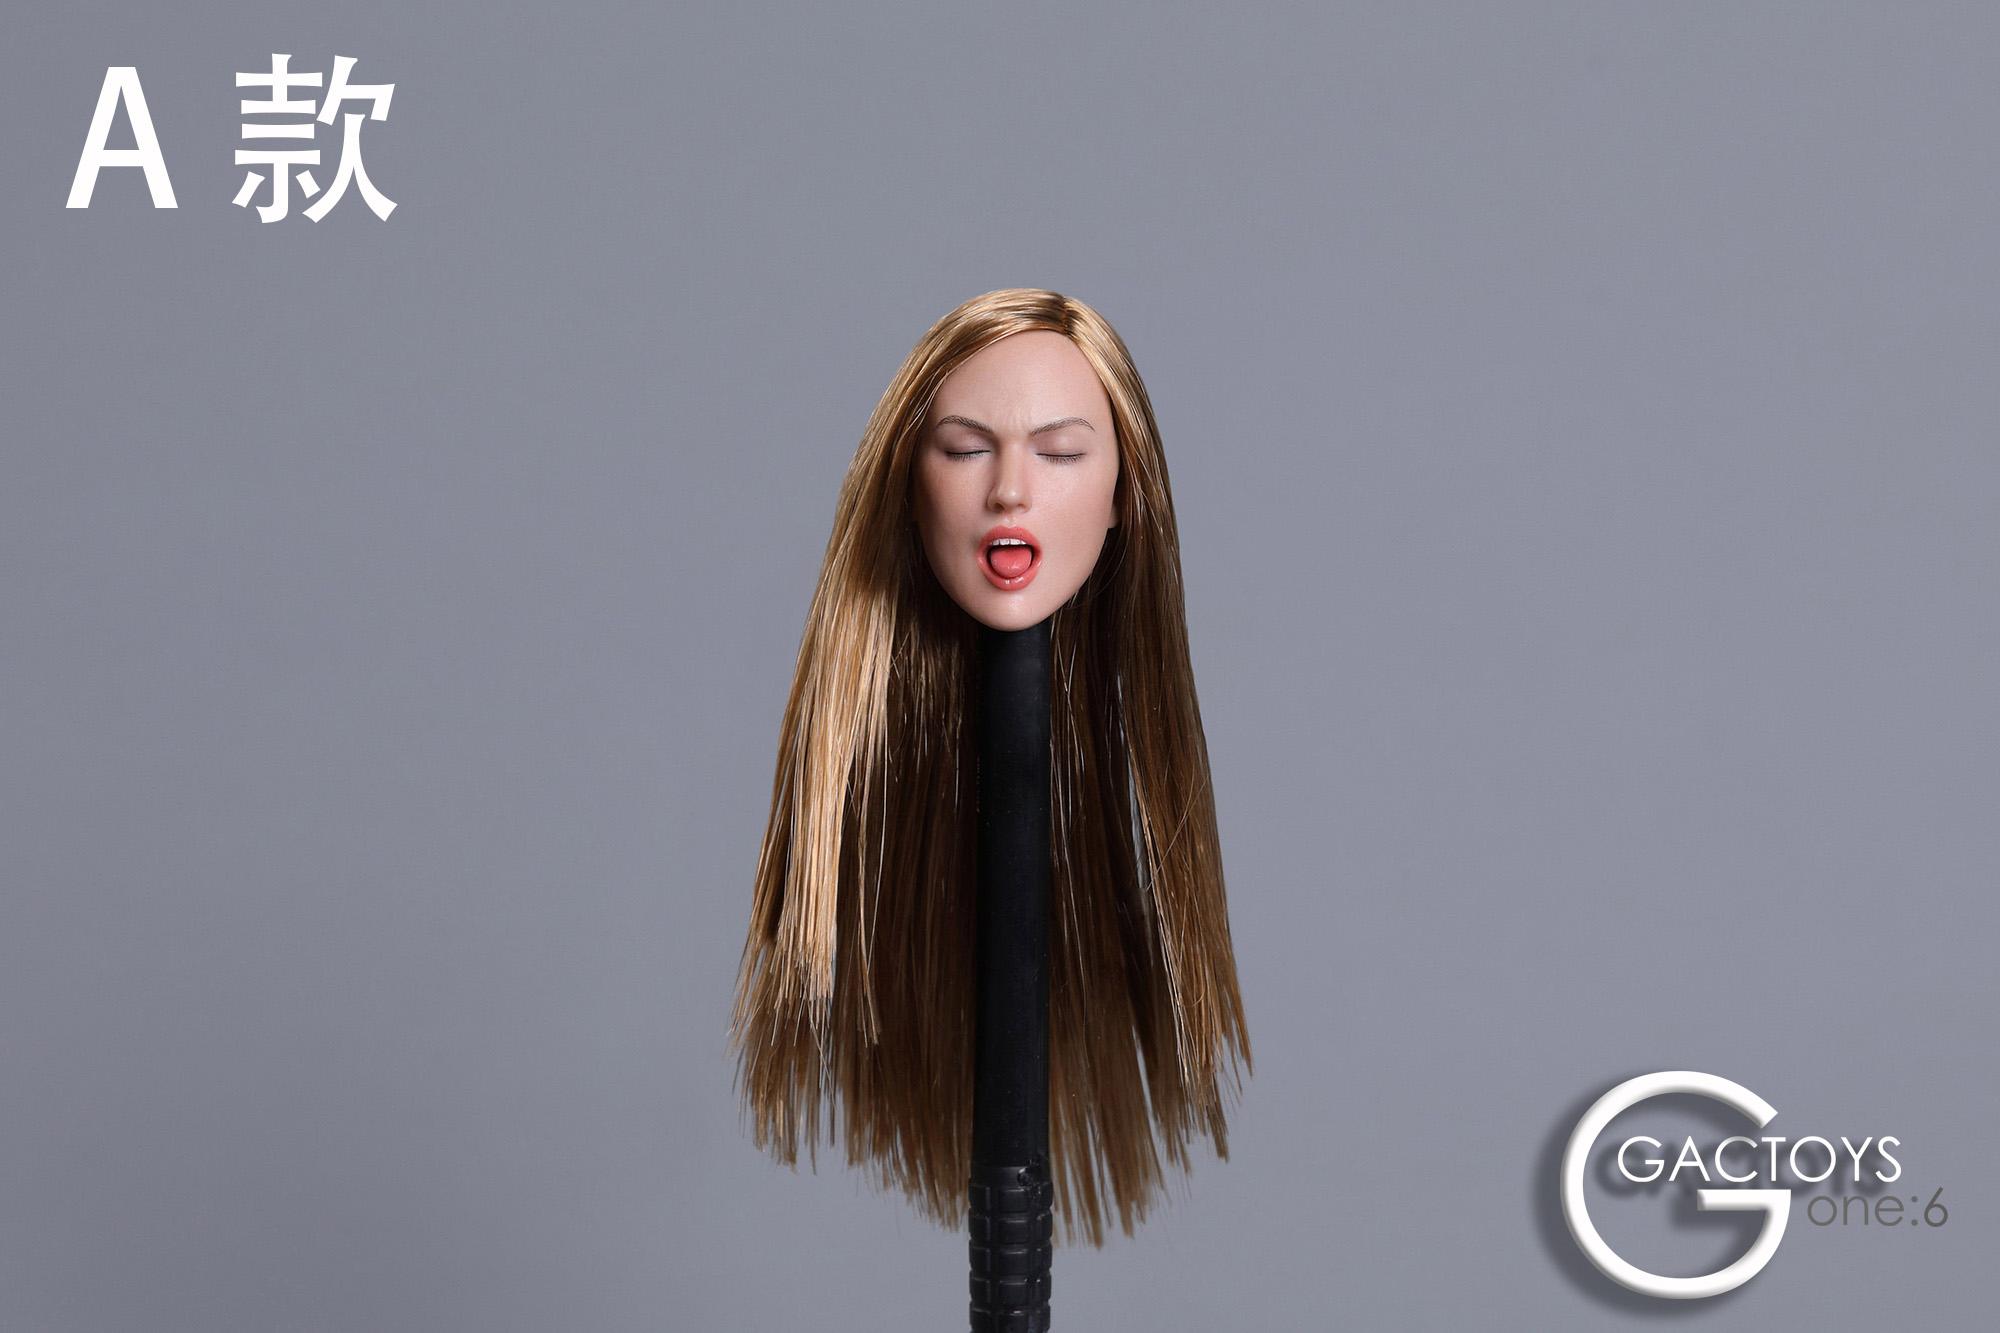 gac-headcry01